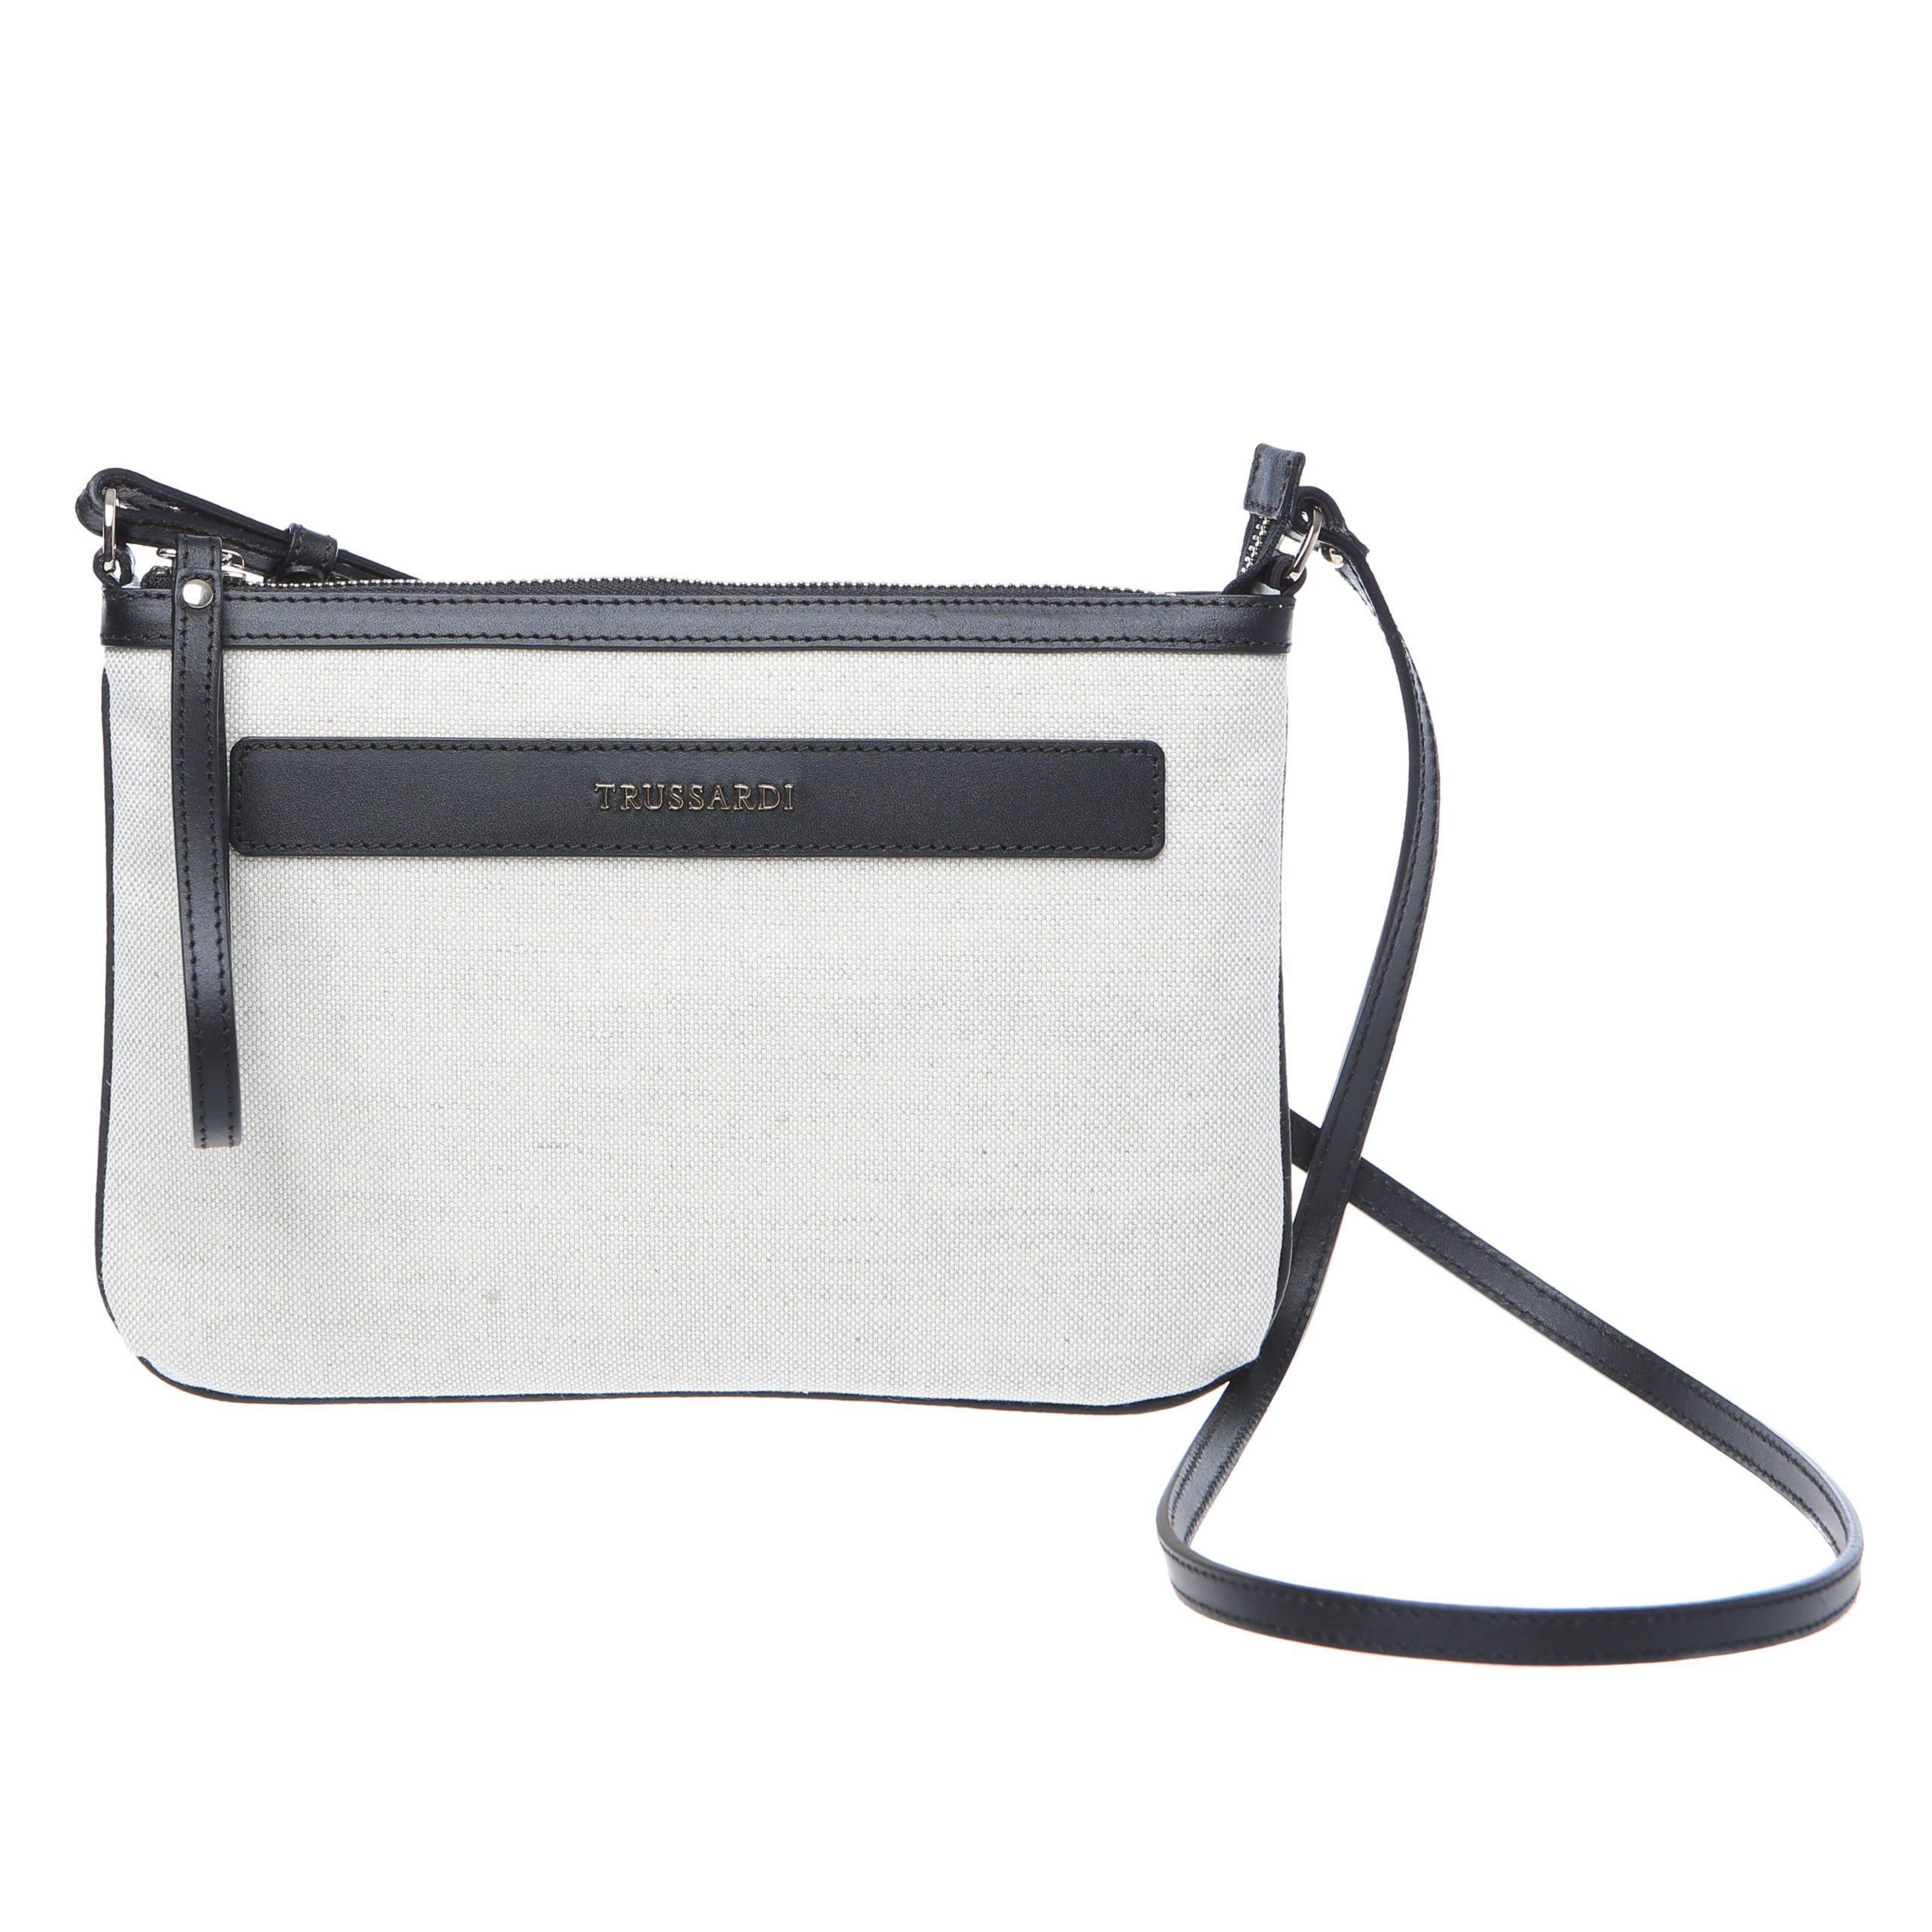 Trussardi Women's Crossbody Bag White 76B121M_119Natural-Black